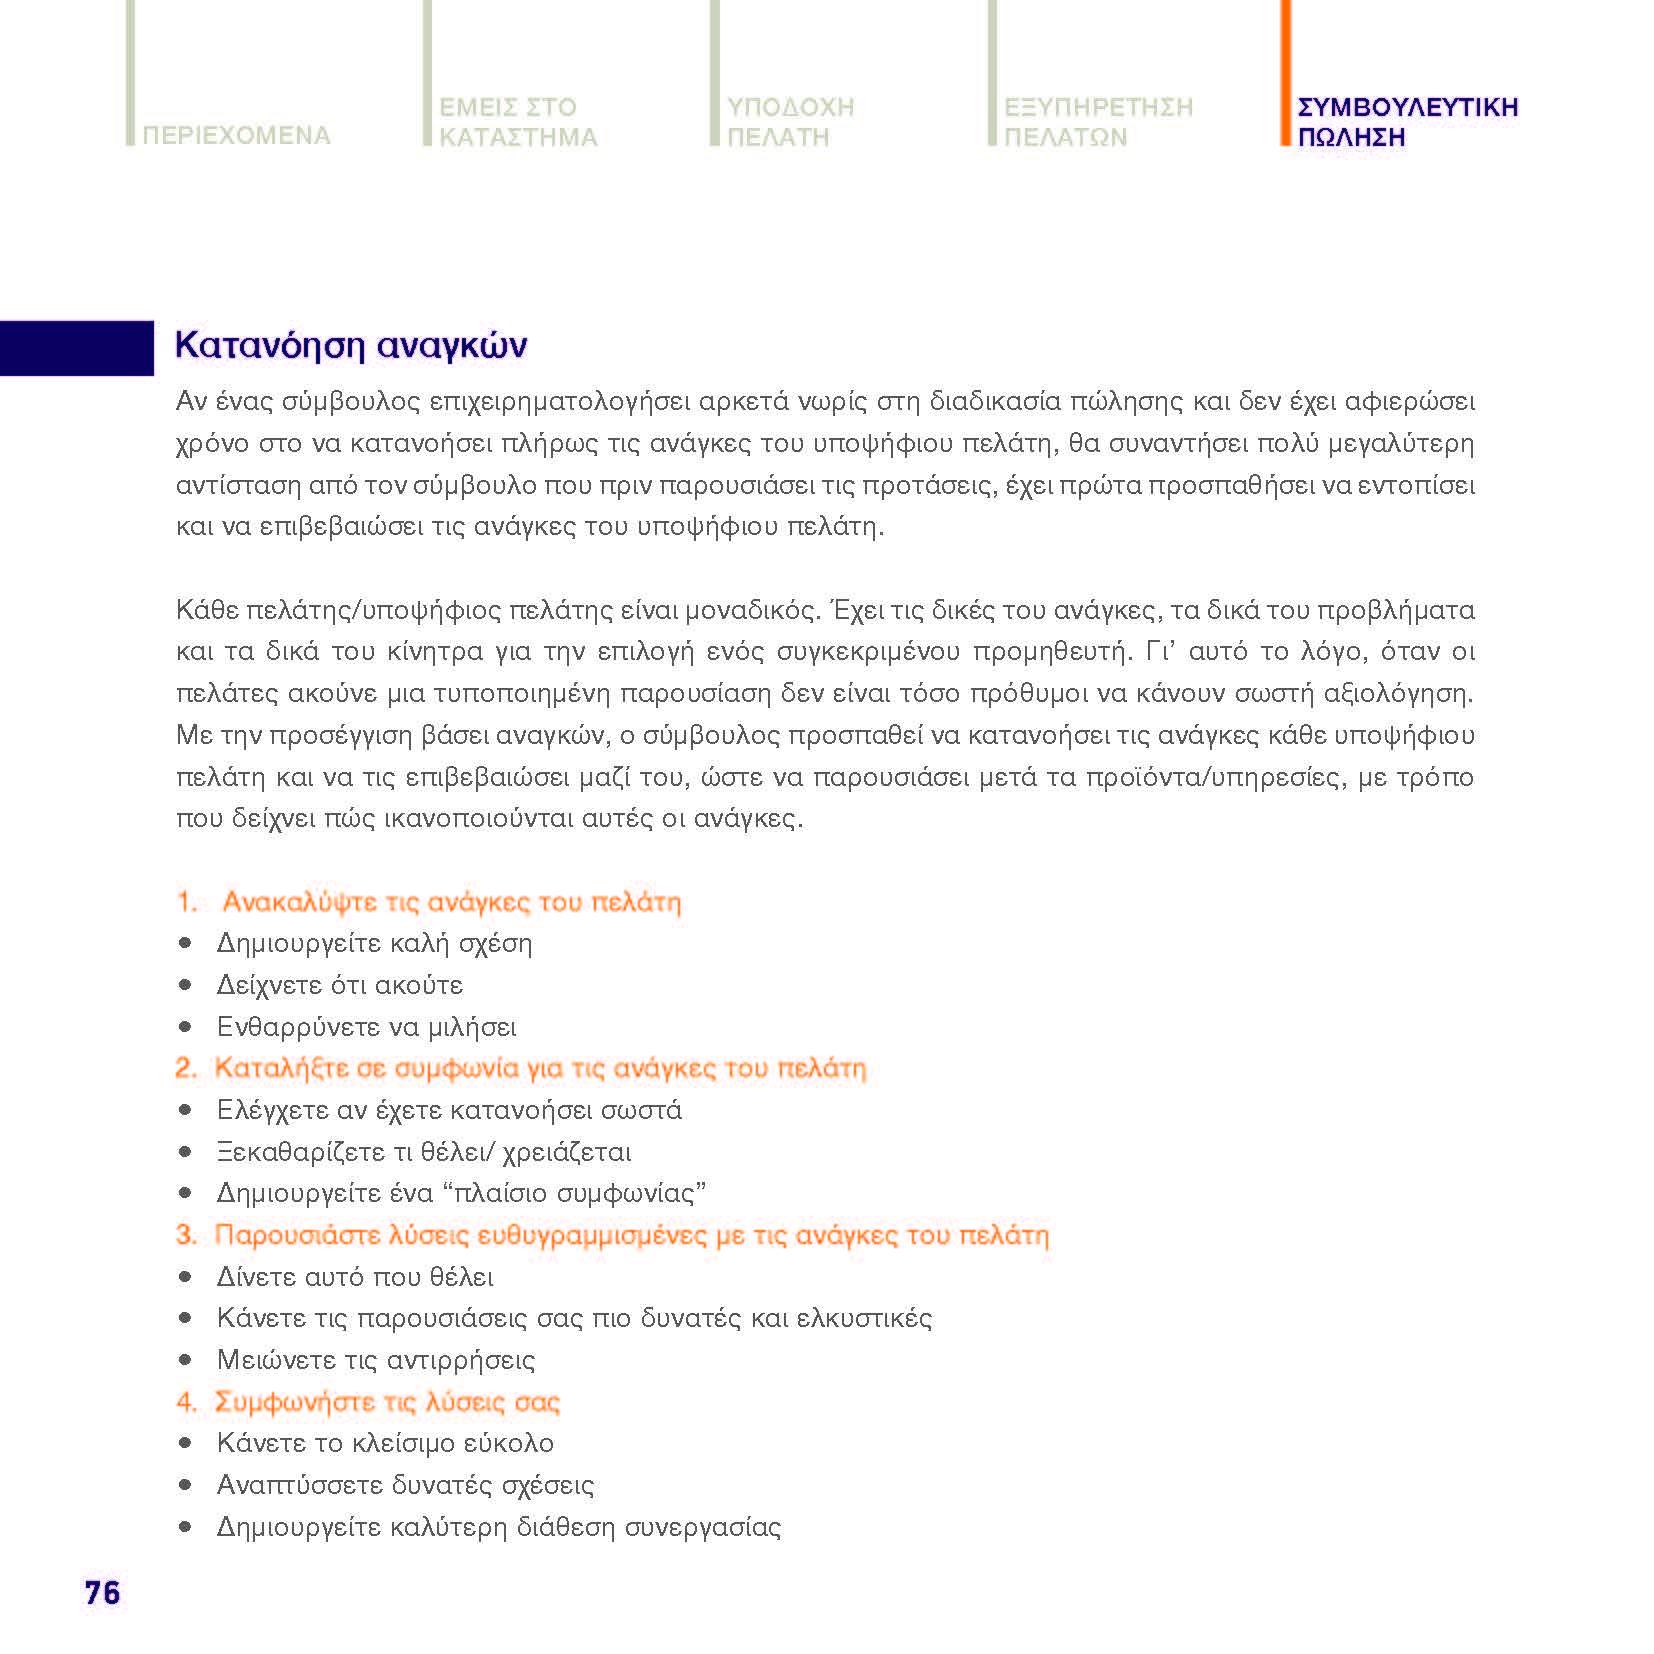 https://www.jib.gr/wp-content/uploads/2020/09/OPTIMA-BANK-BOOKLET-WEB_Page_076.jpg